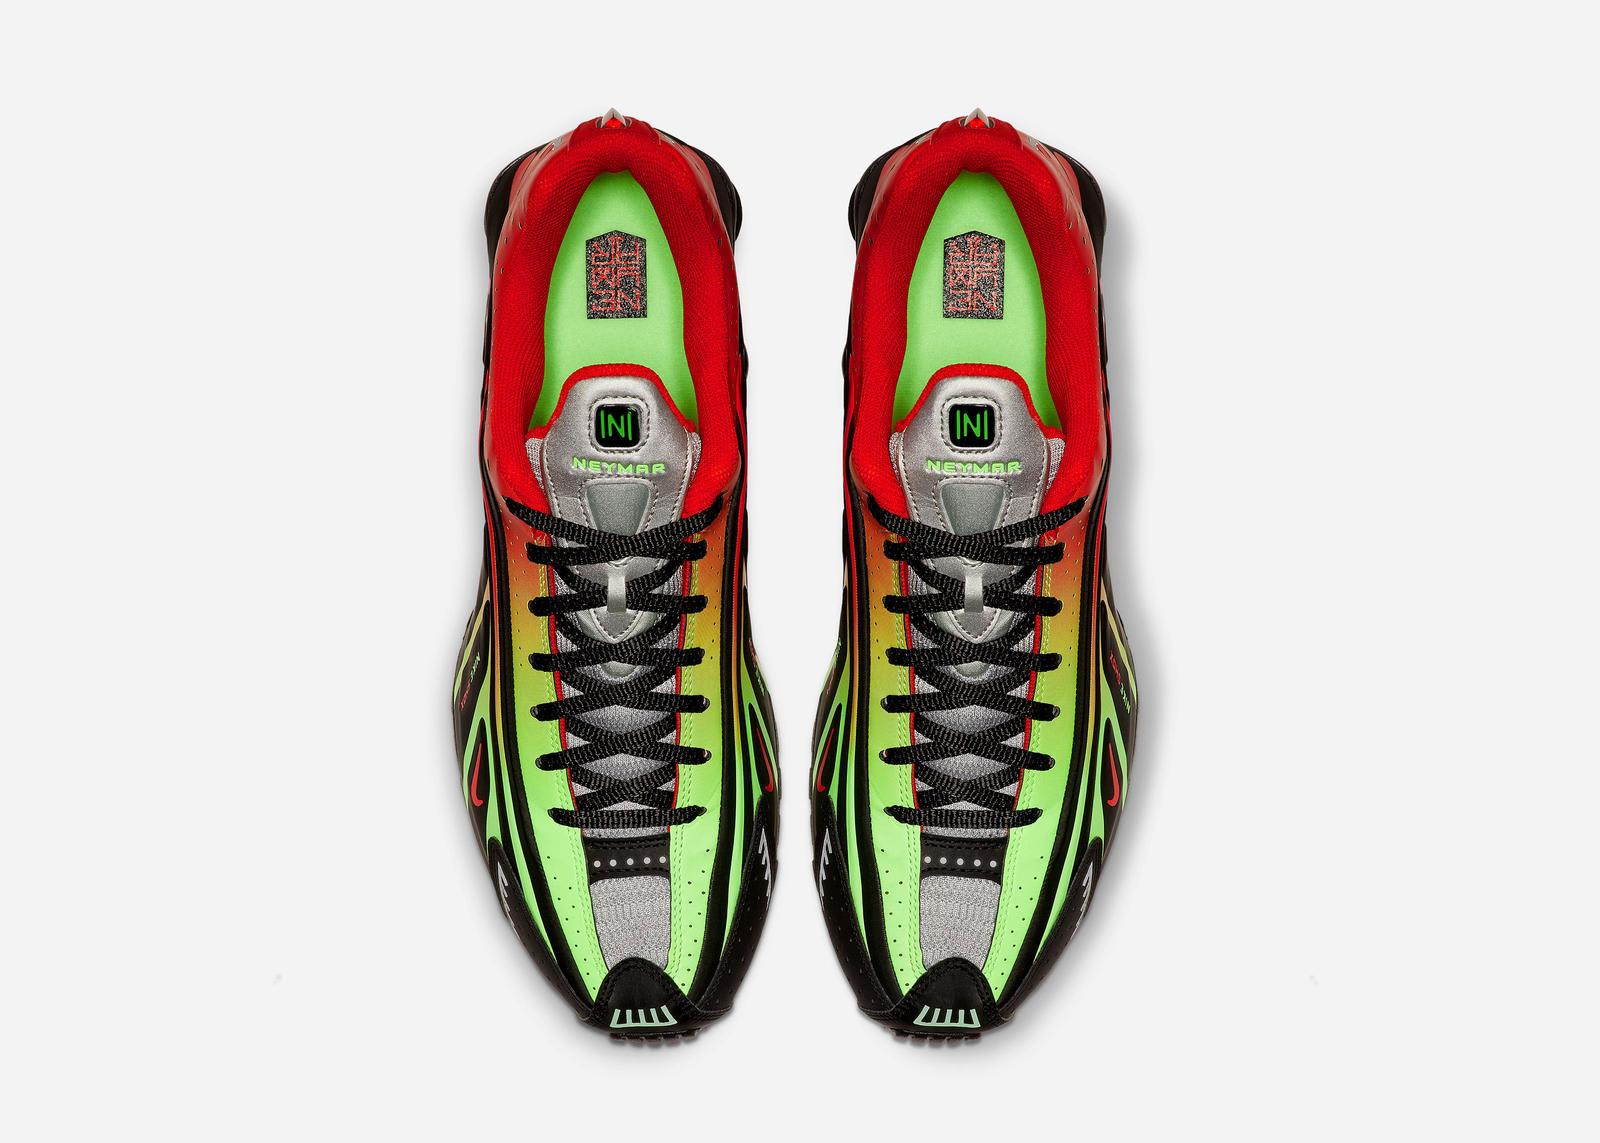 Nike Shox R4 'Neymar/Watermleon' (Top)